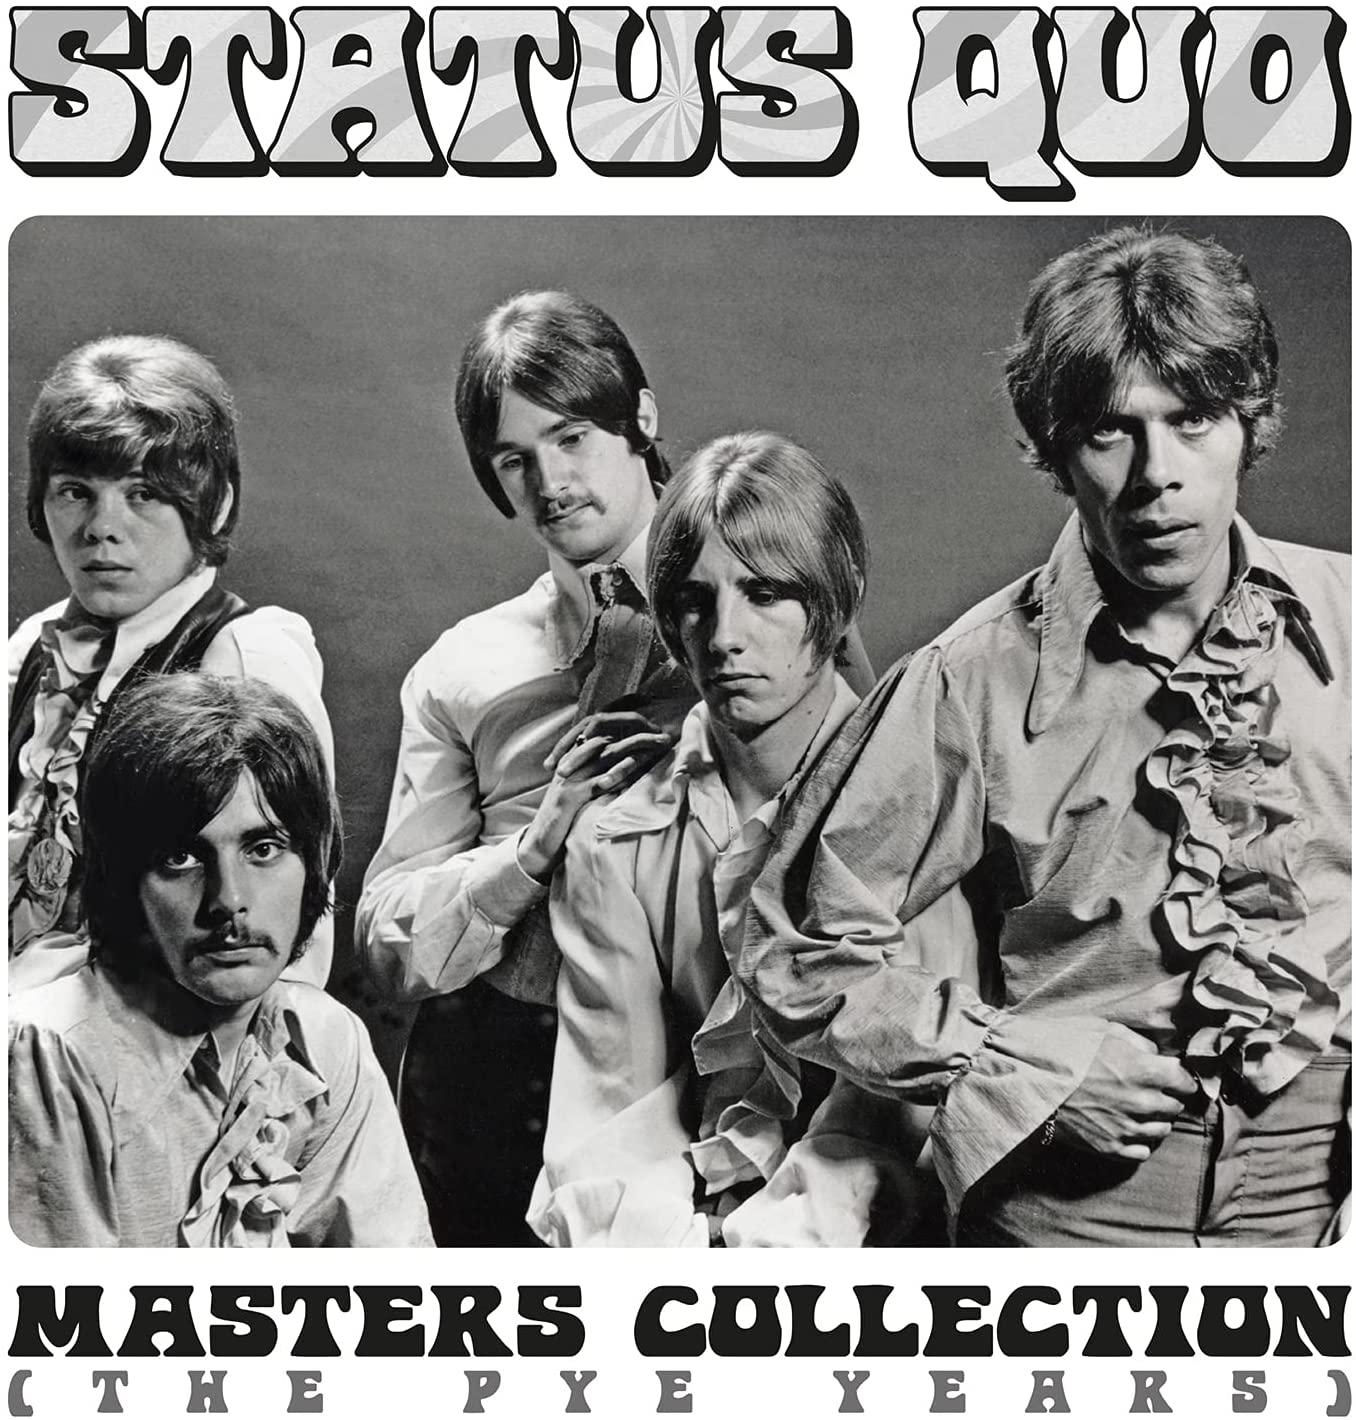 Status Quo - Masters Collection [2xLP] (coloured vinyl)